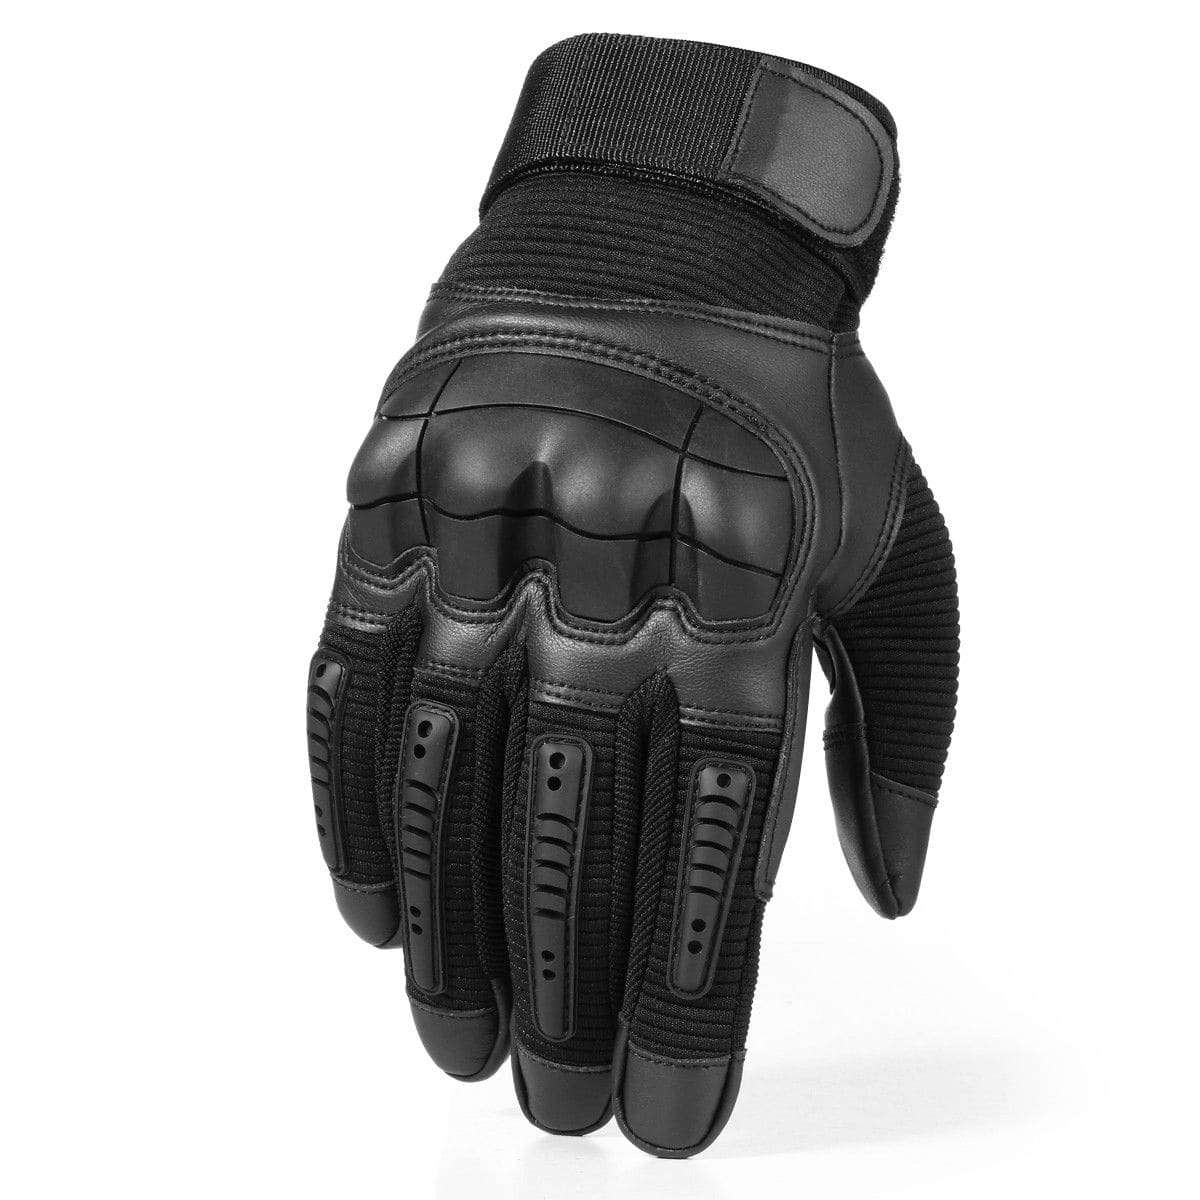 Leather hard knuckle